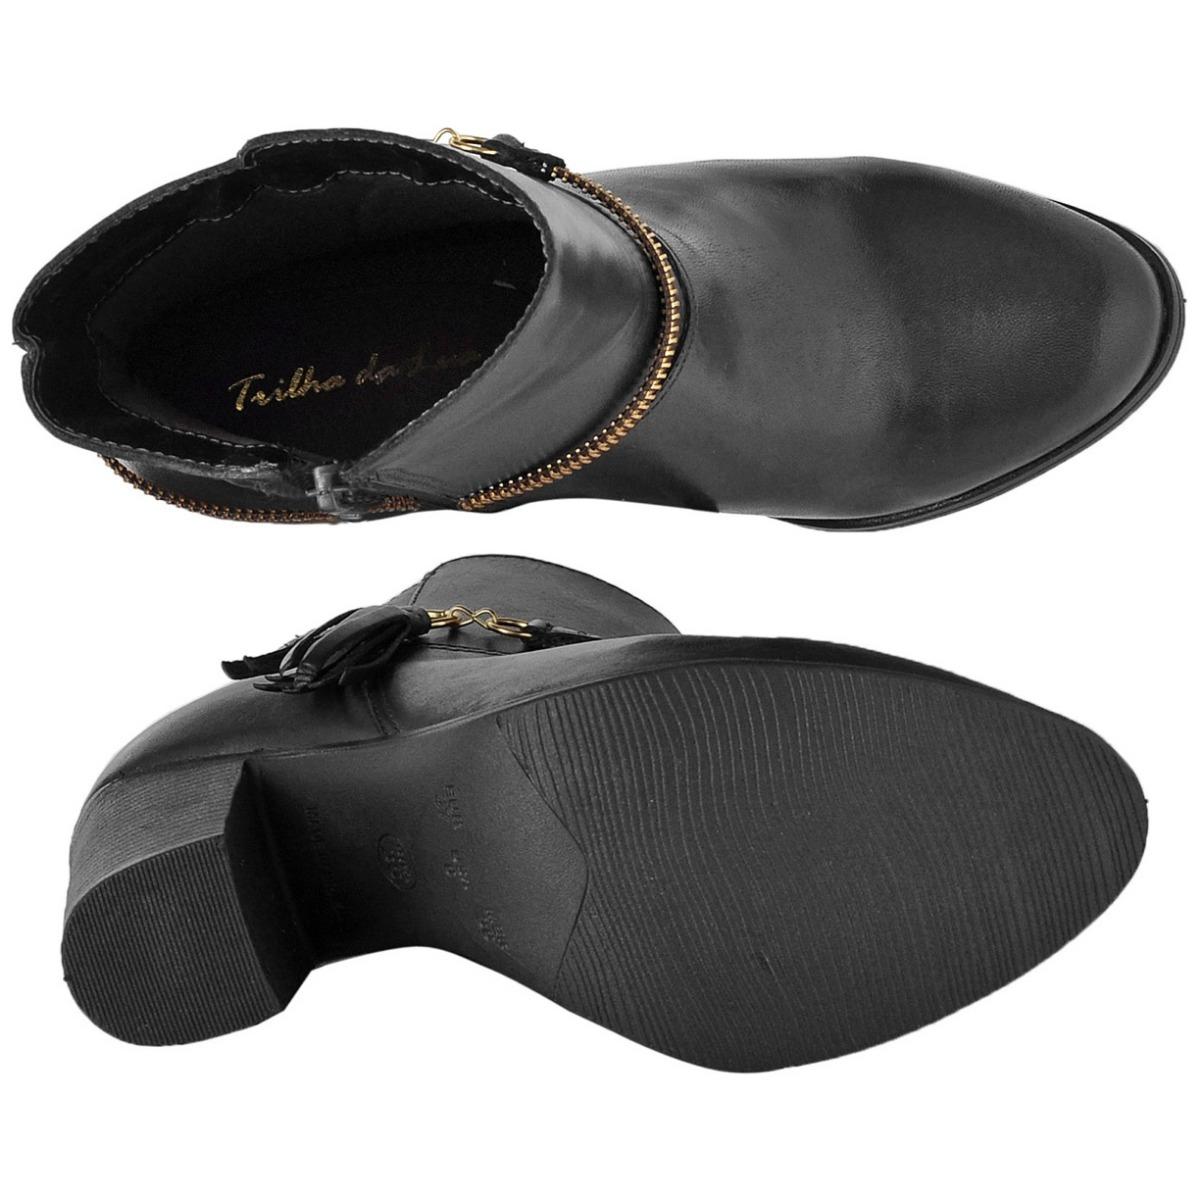 717318a682 bota feminina cano curto couro legítimo franja lateral c65cb. Carregando  zoom.